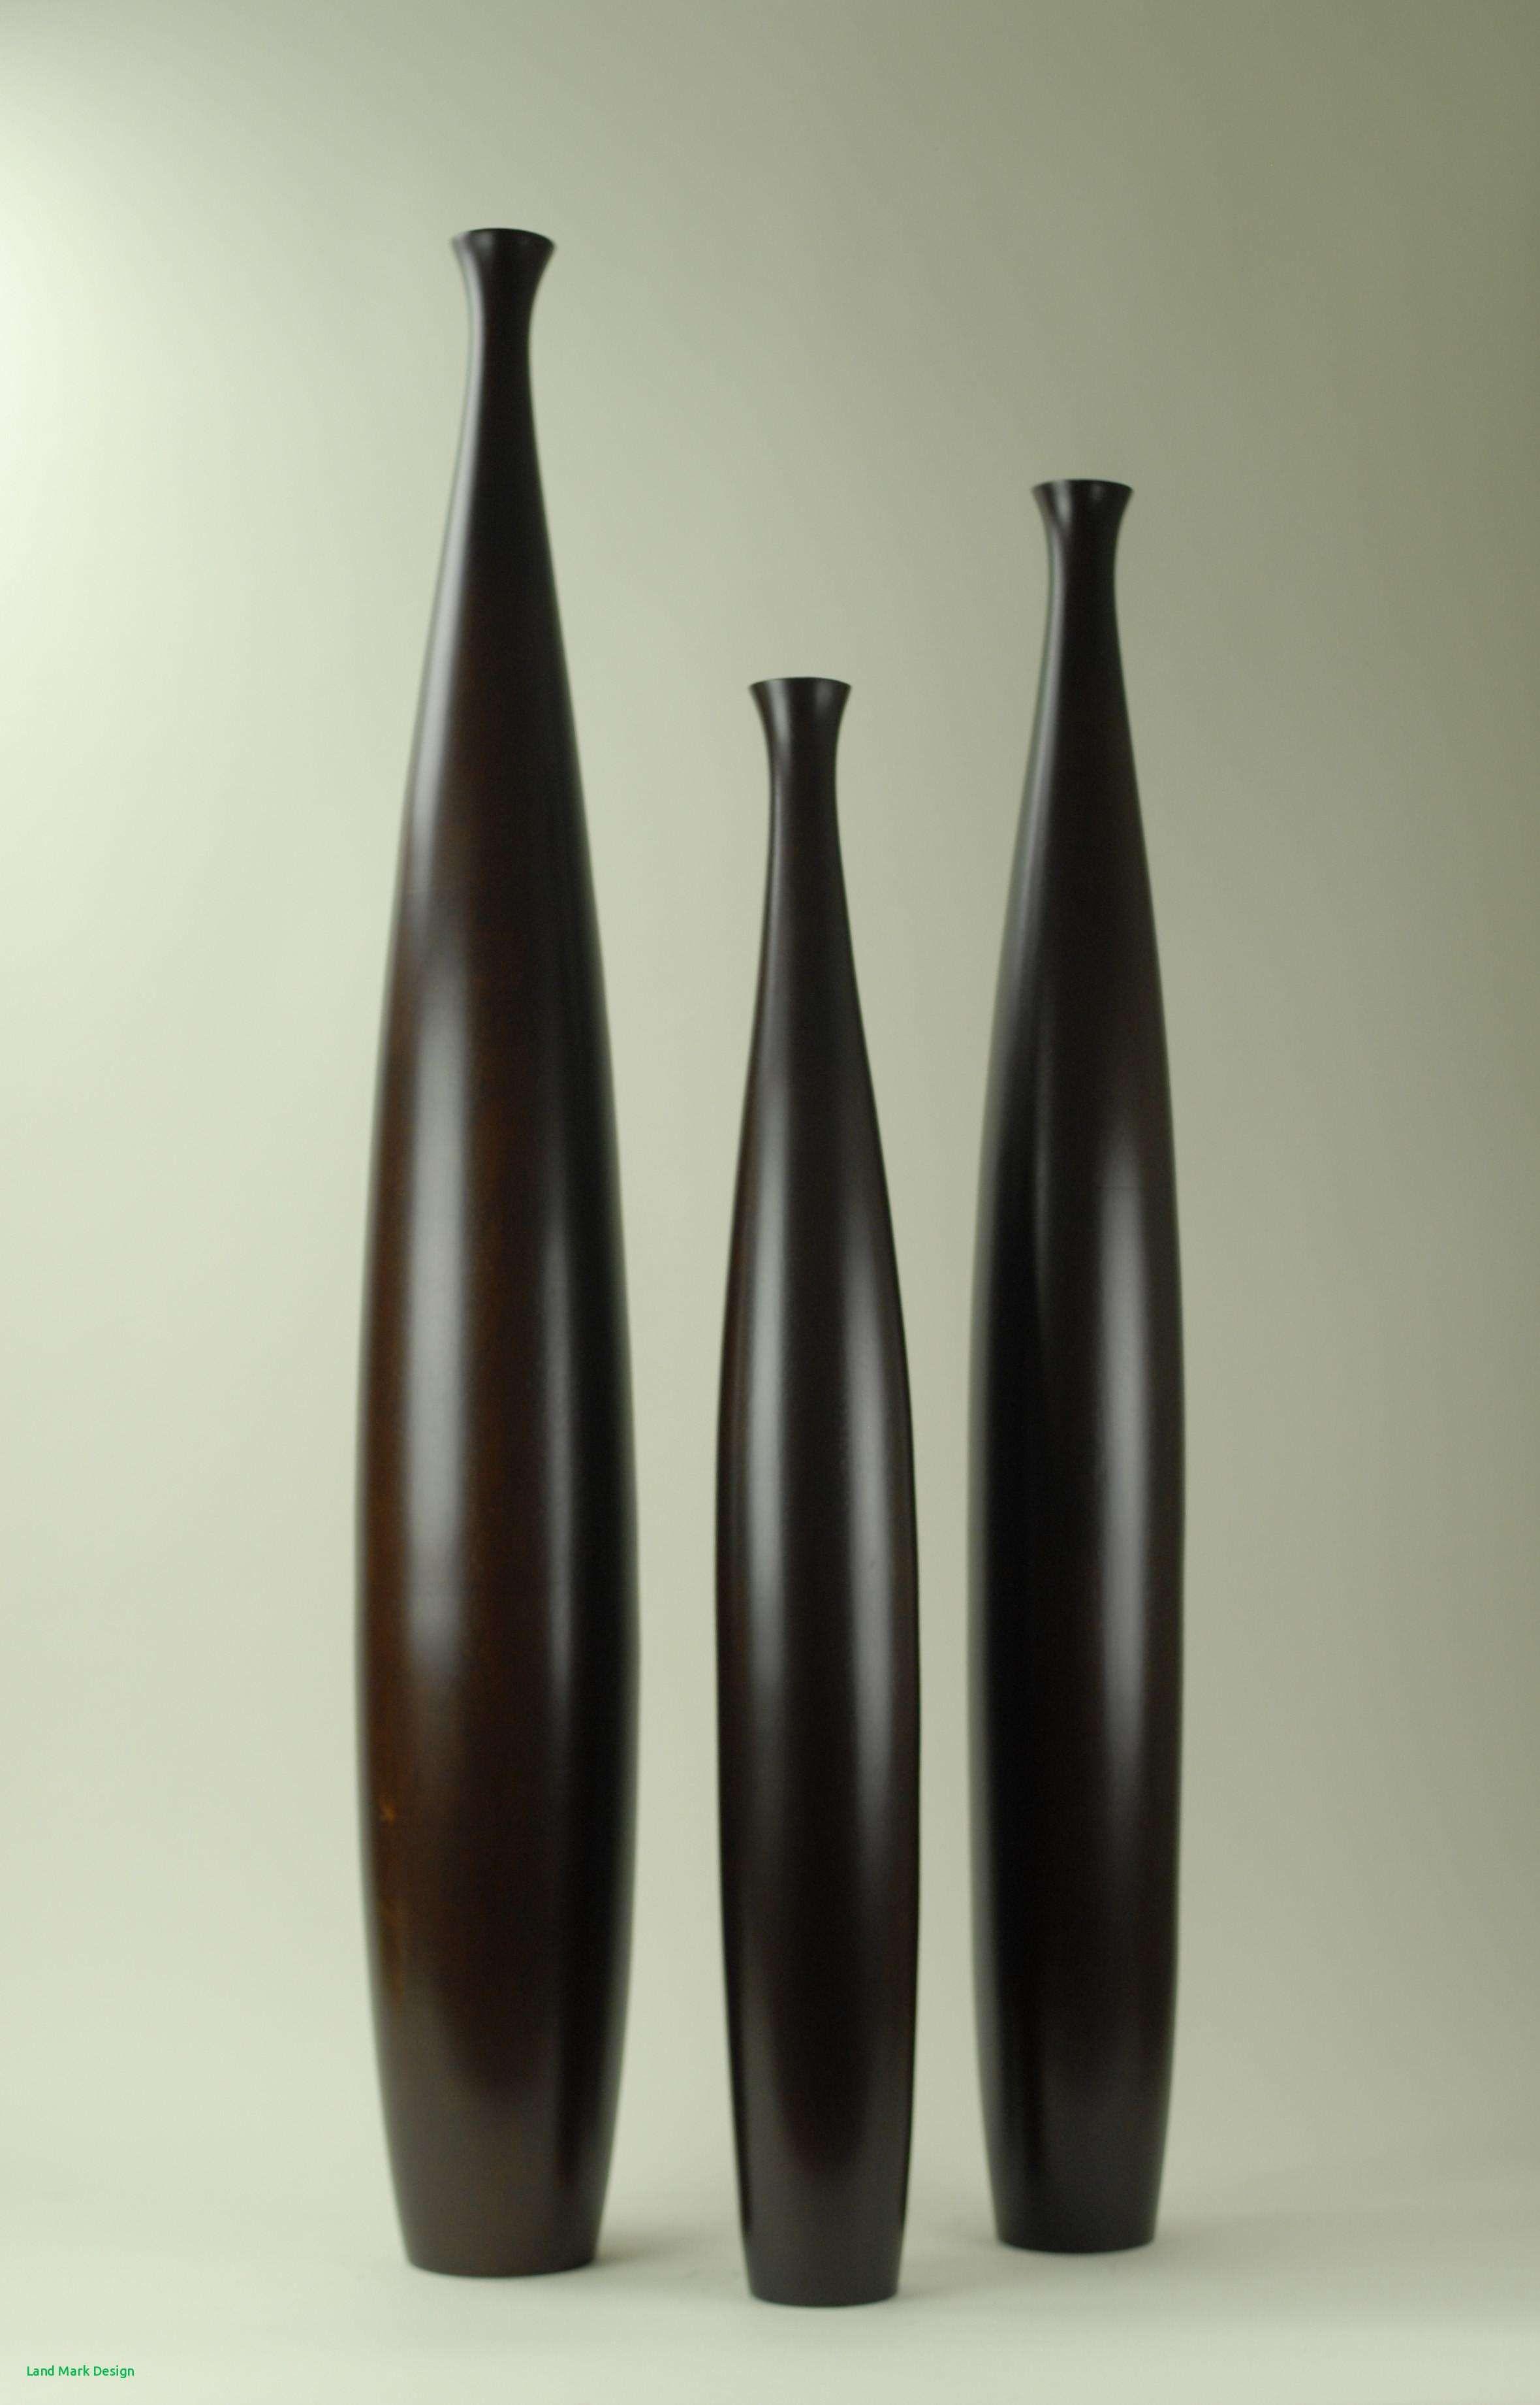 plastic floor vase of 30 large floor vase the weekly world in white floor vase ceramic modern 40 inchl home design ikea inch